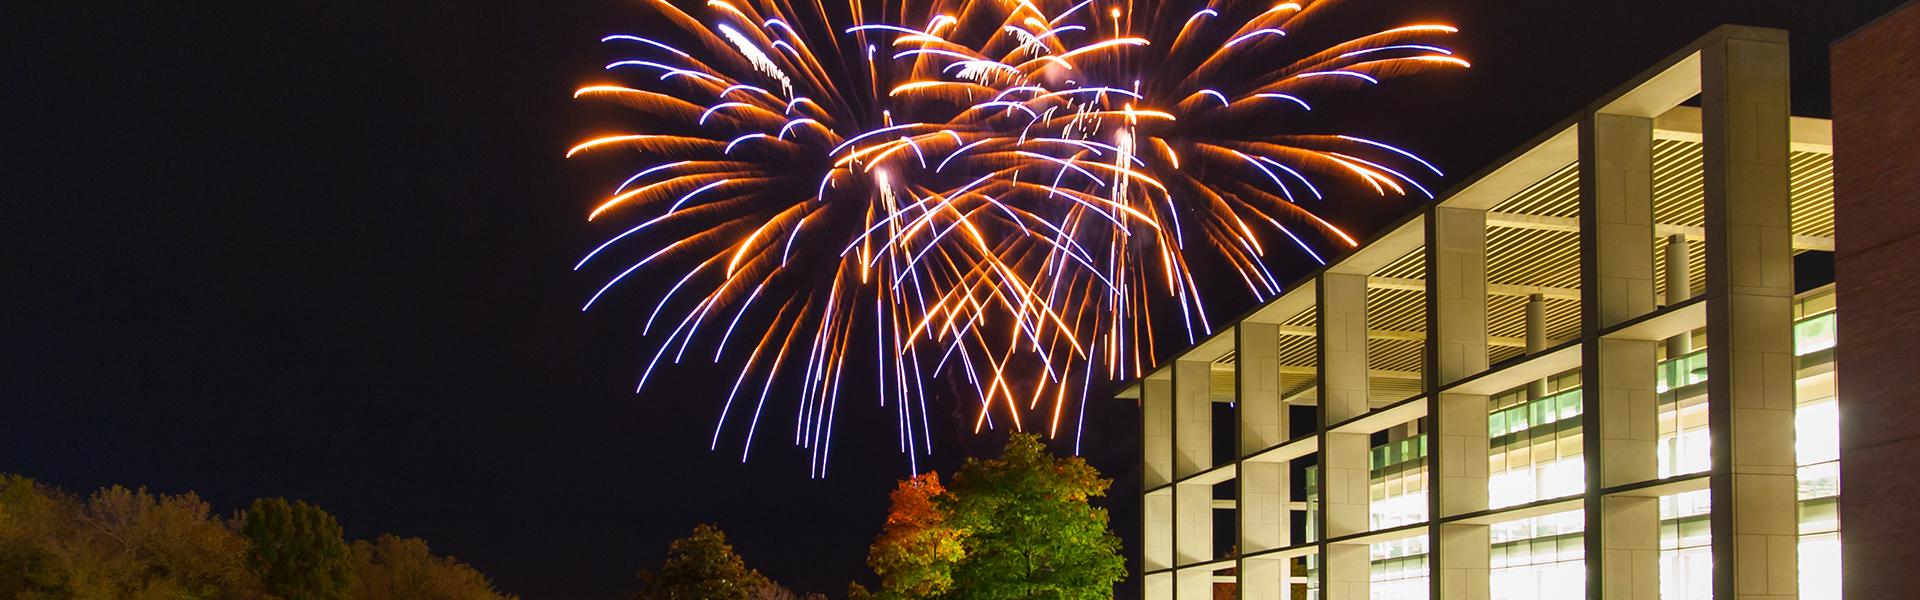 20141010-ilo-homecoming-fireworks-006